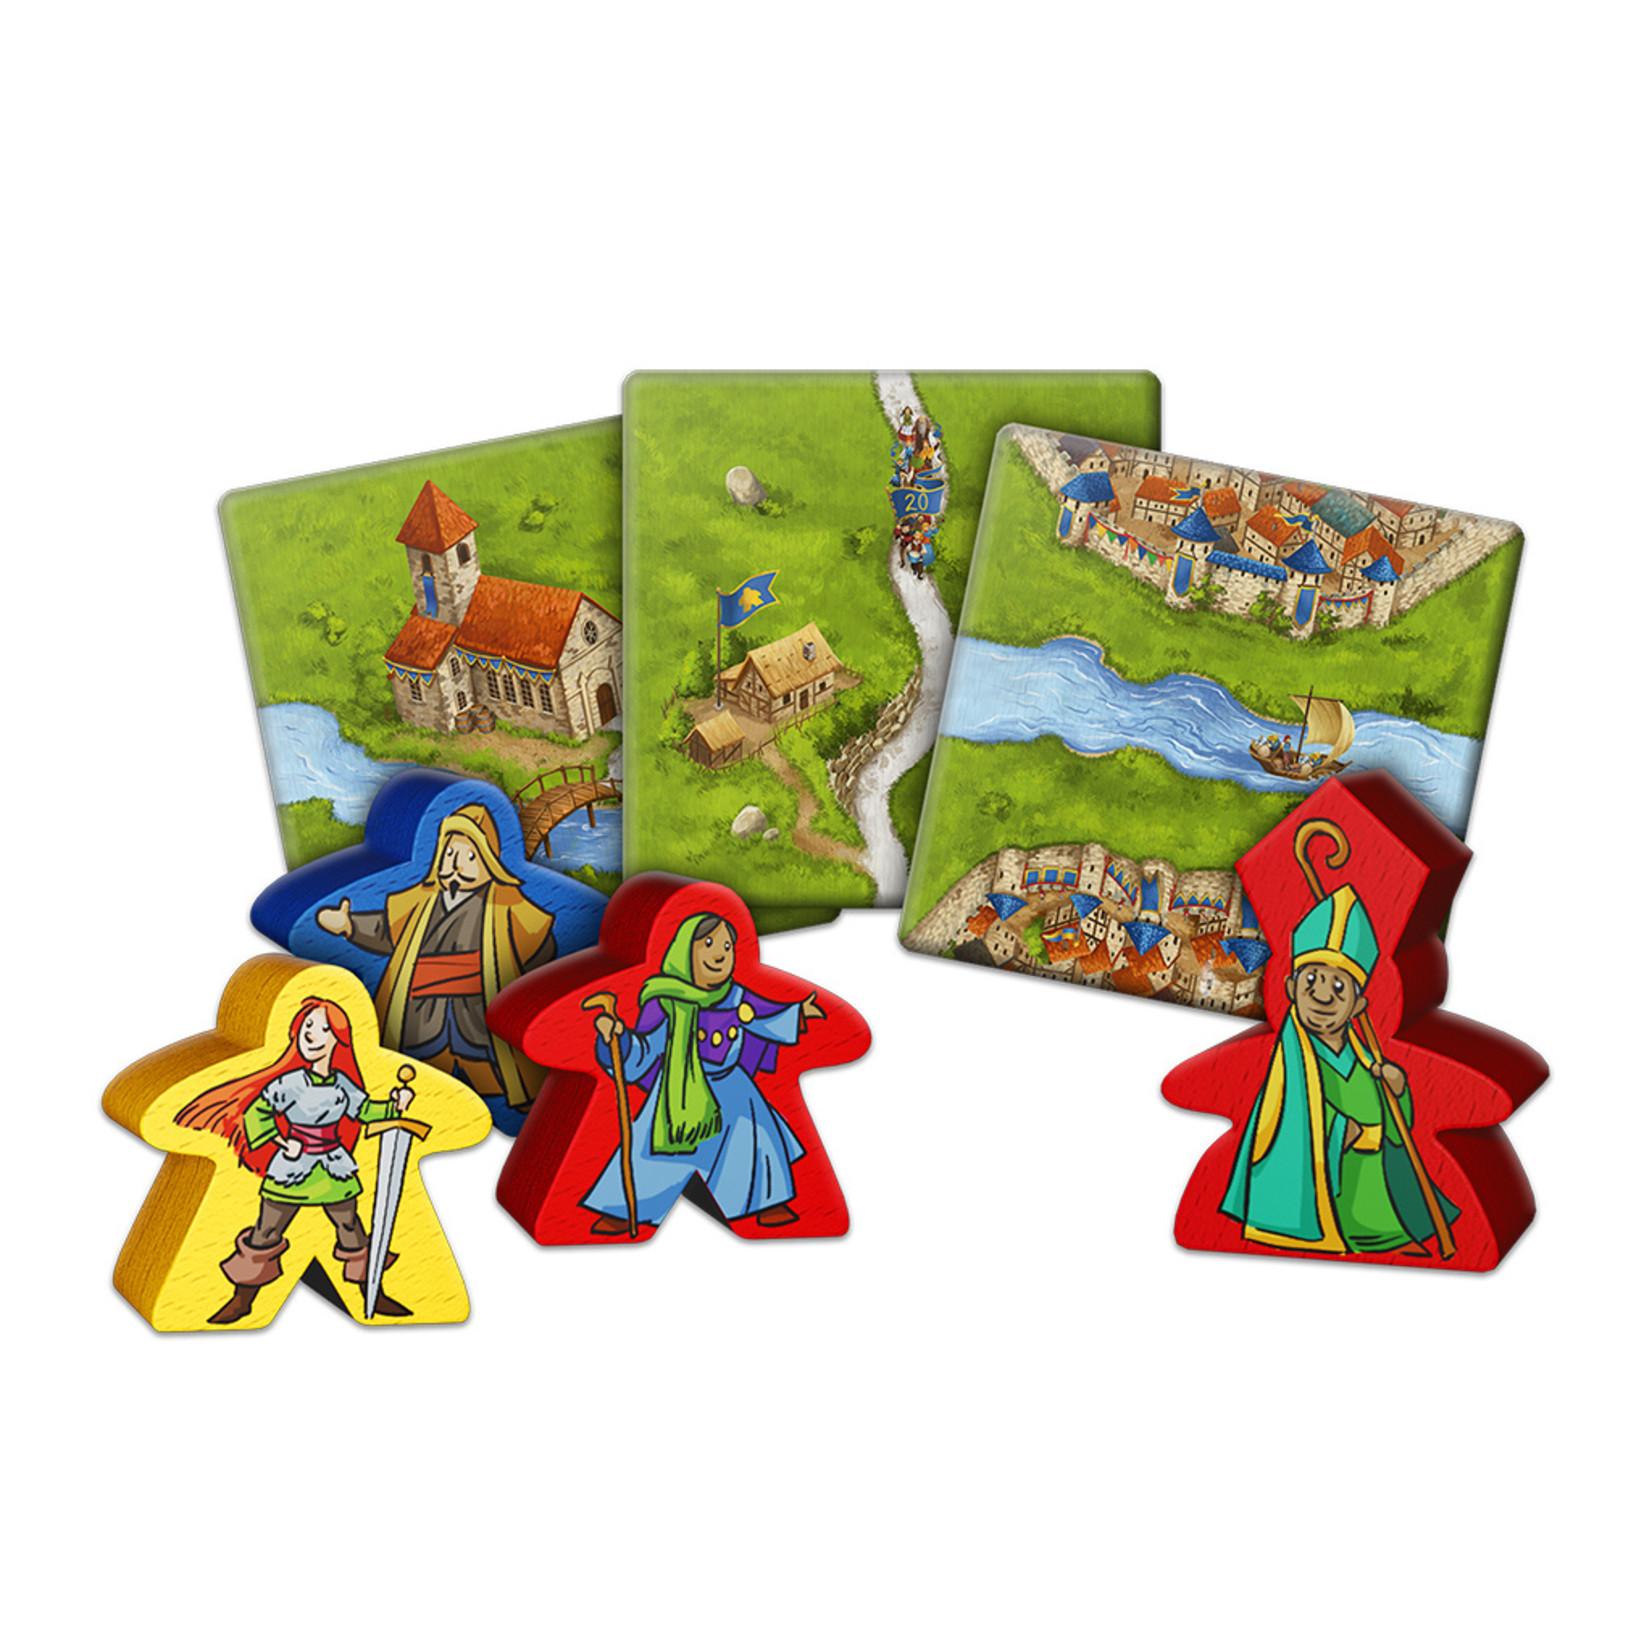 PRE-ORDER Carcassonne 20th Anniversary